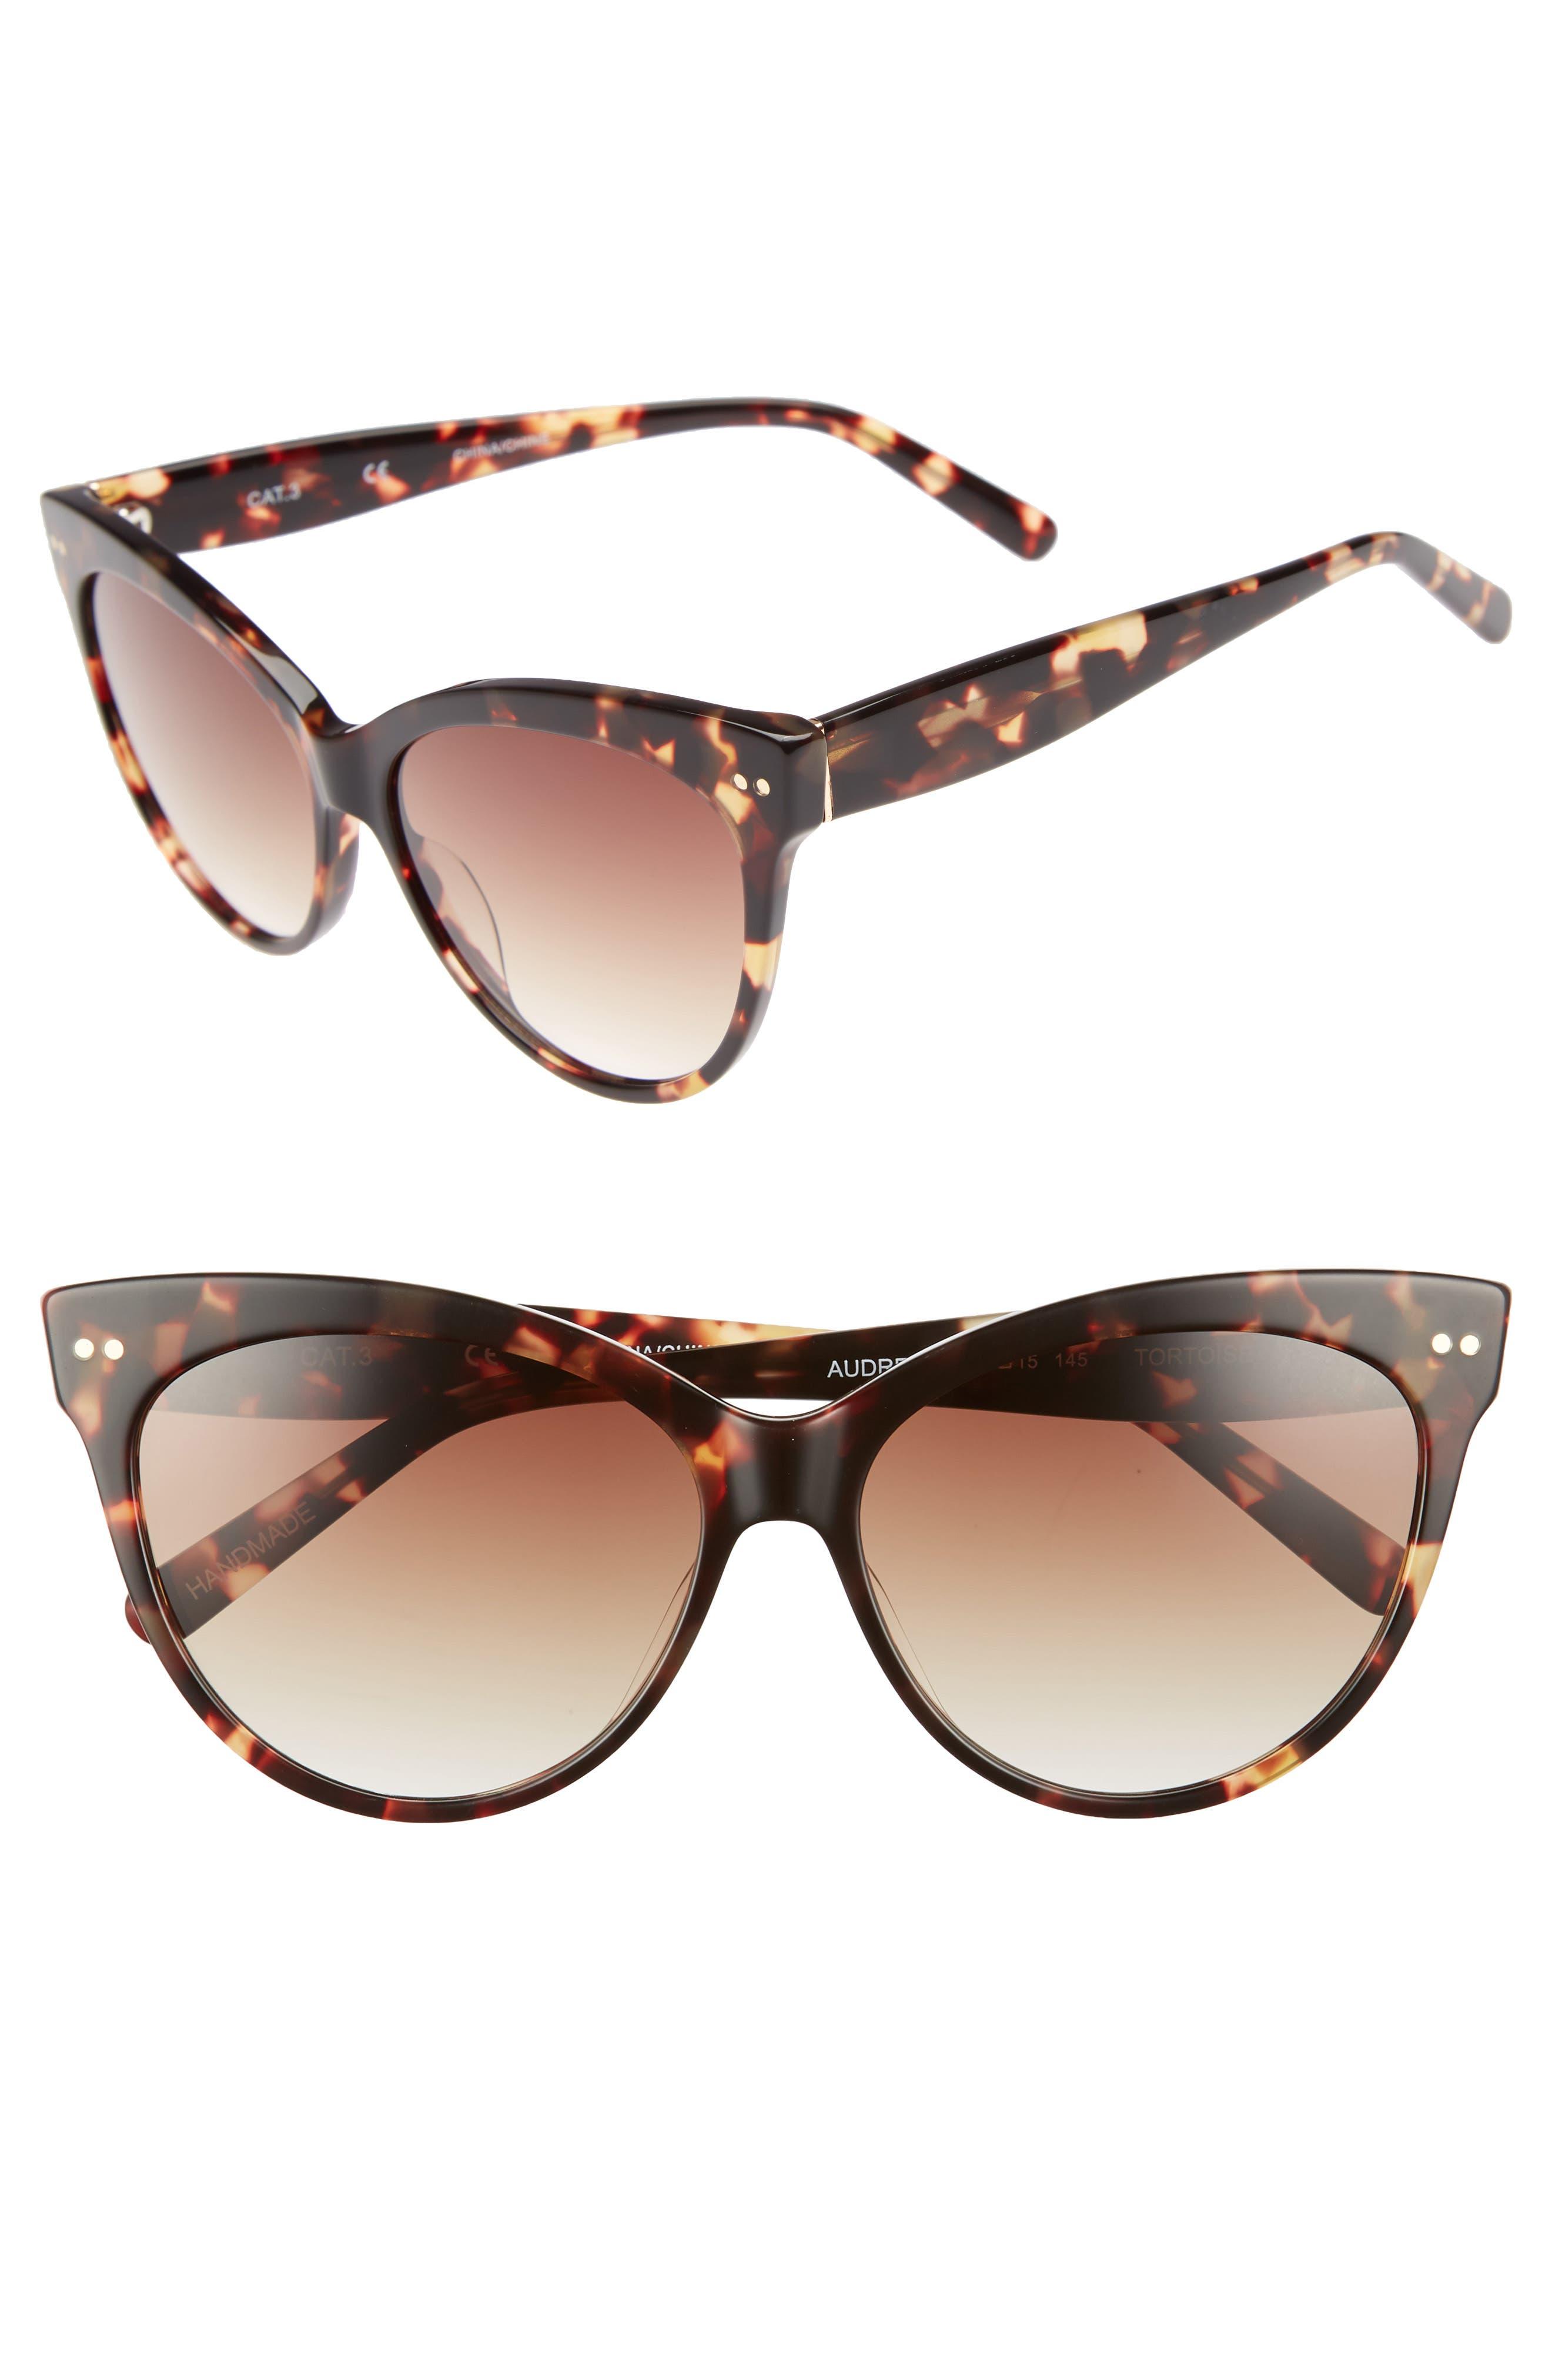 Audrey 60mm Cat Eye Sunglasses,                             Main thumbnail 1, color,                             Brown Tortoise